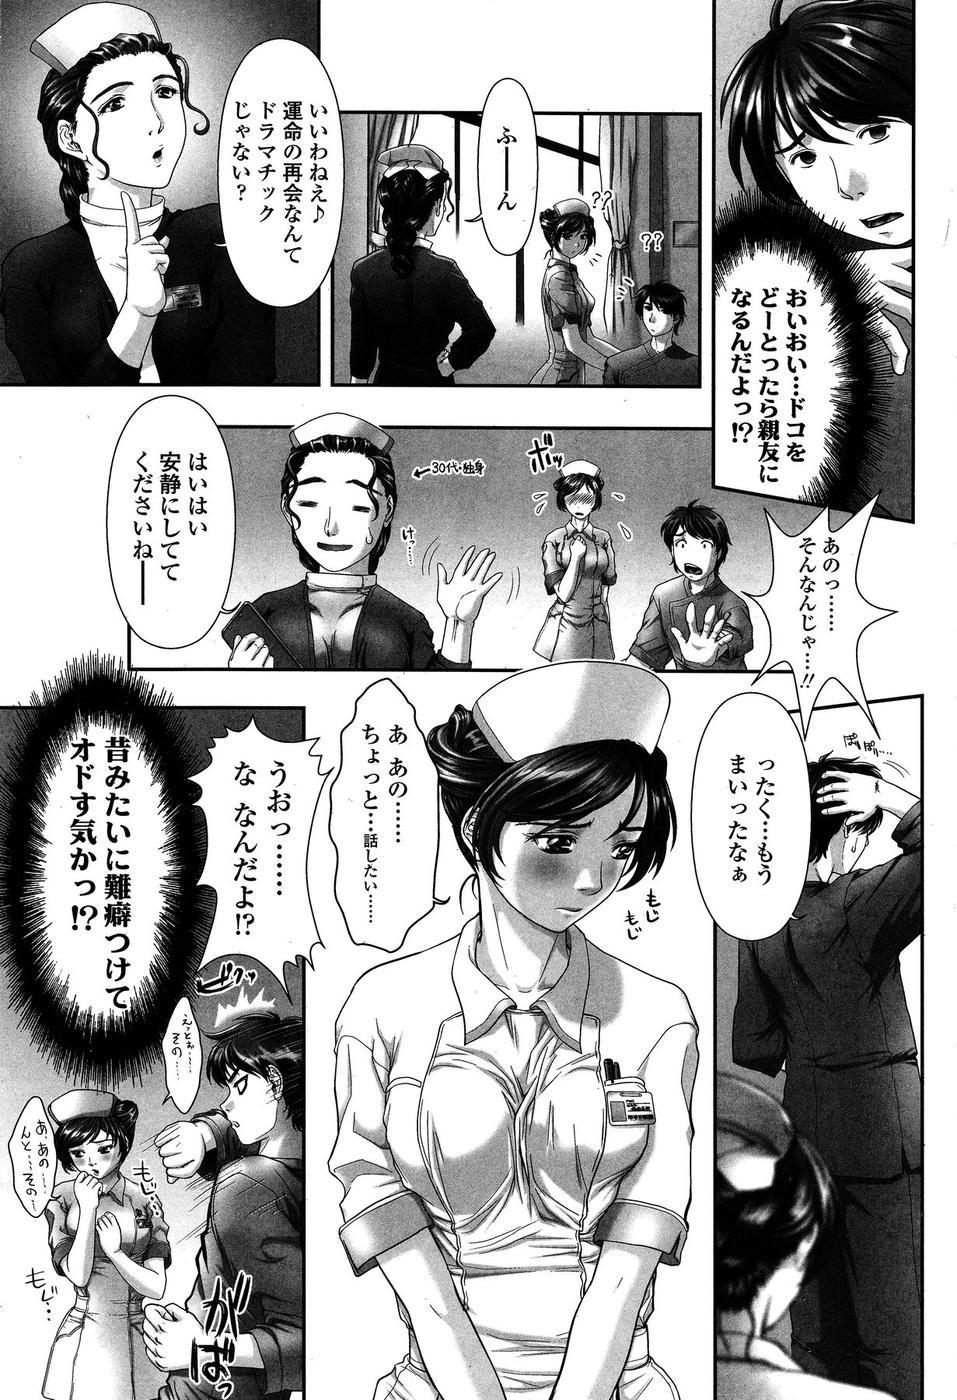 COMIC SIGMA 2009-01 Vol.28 23